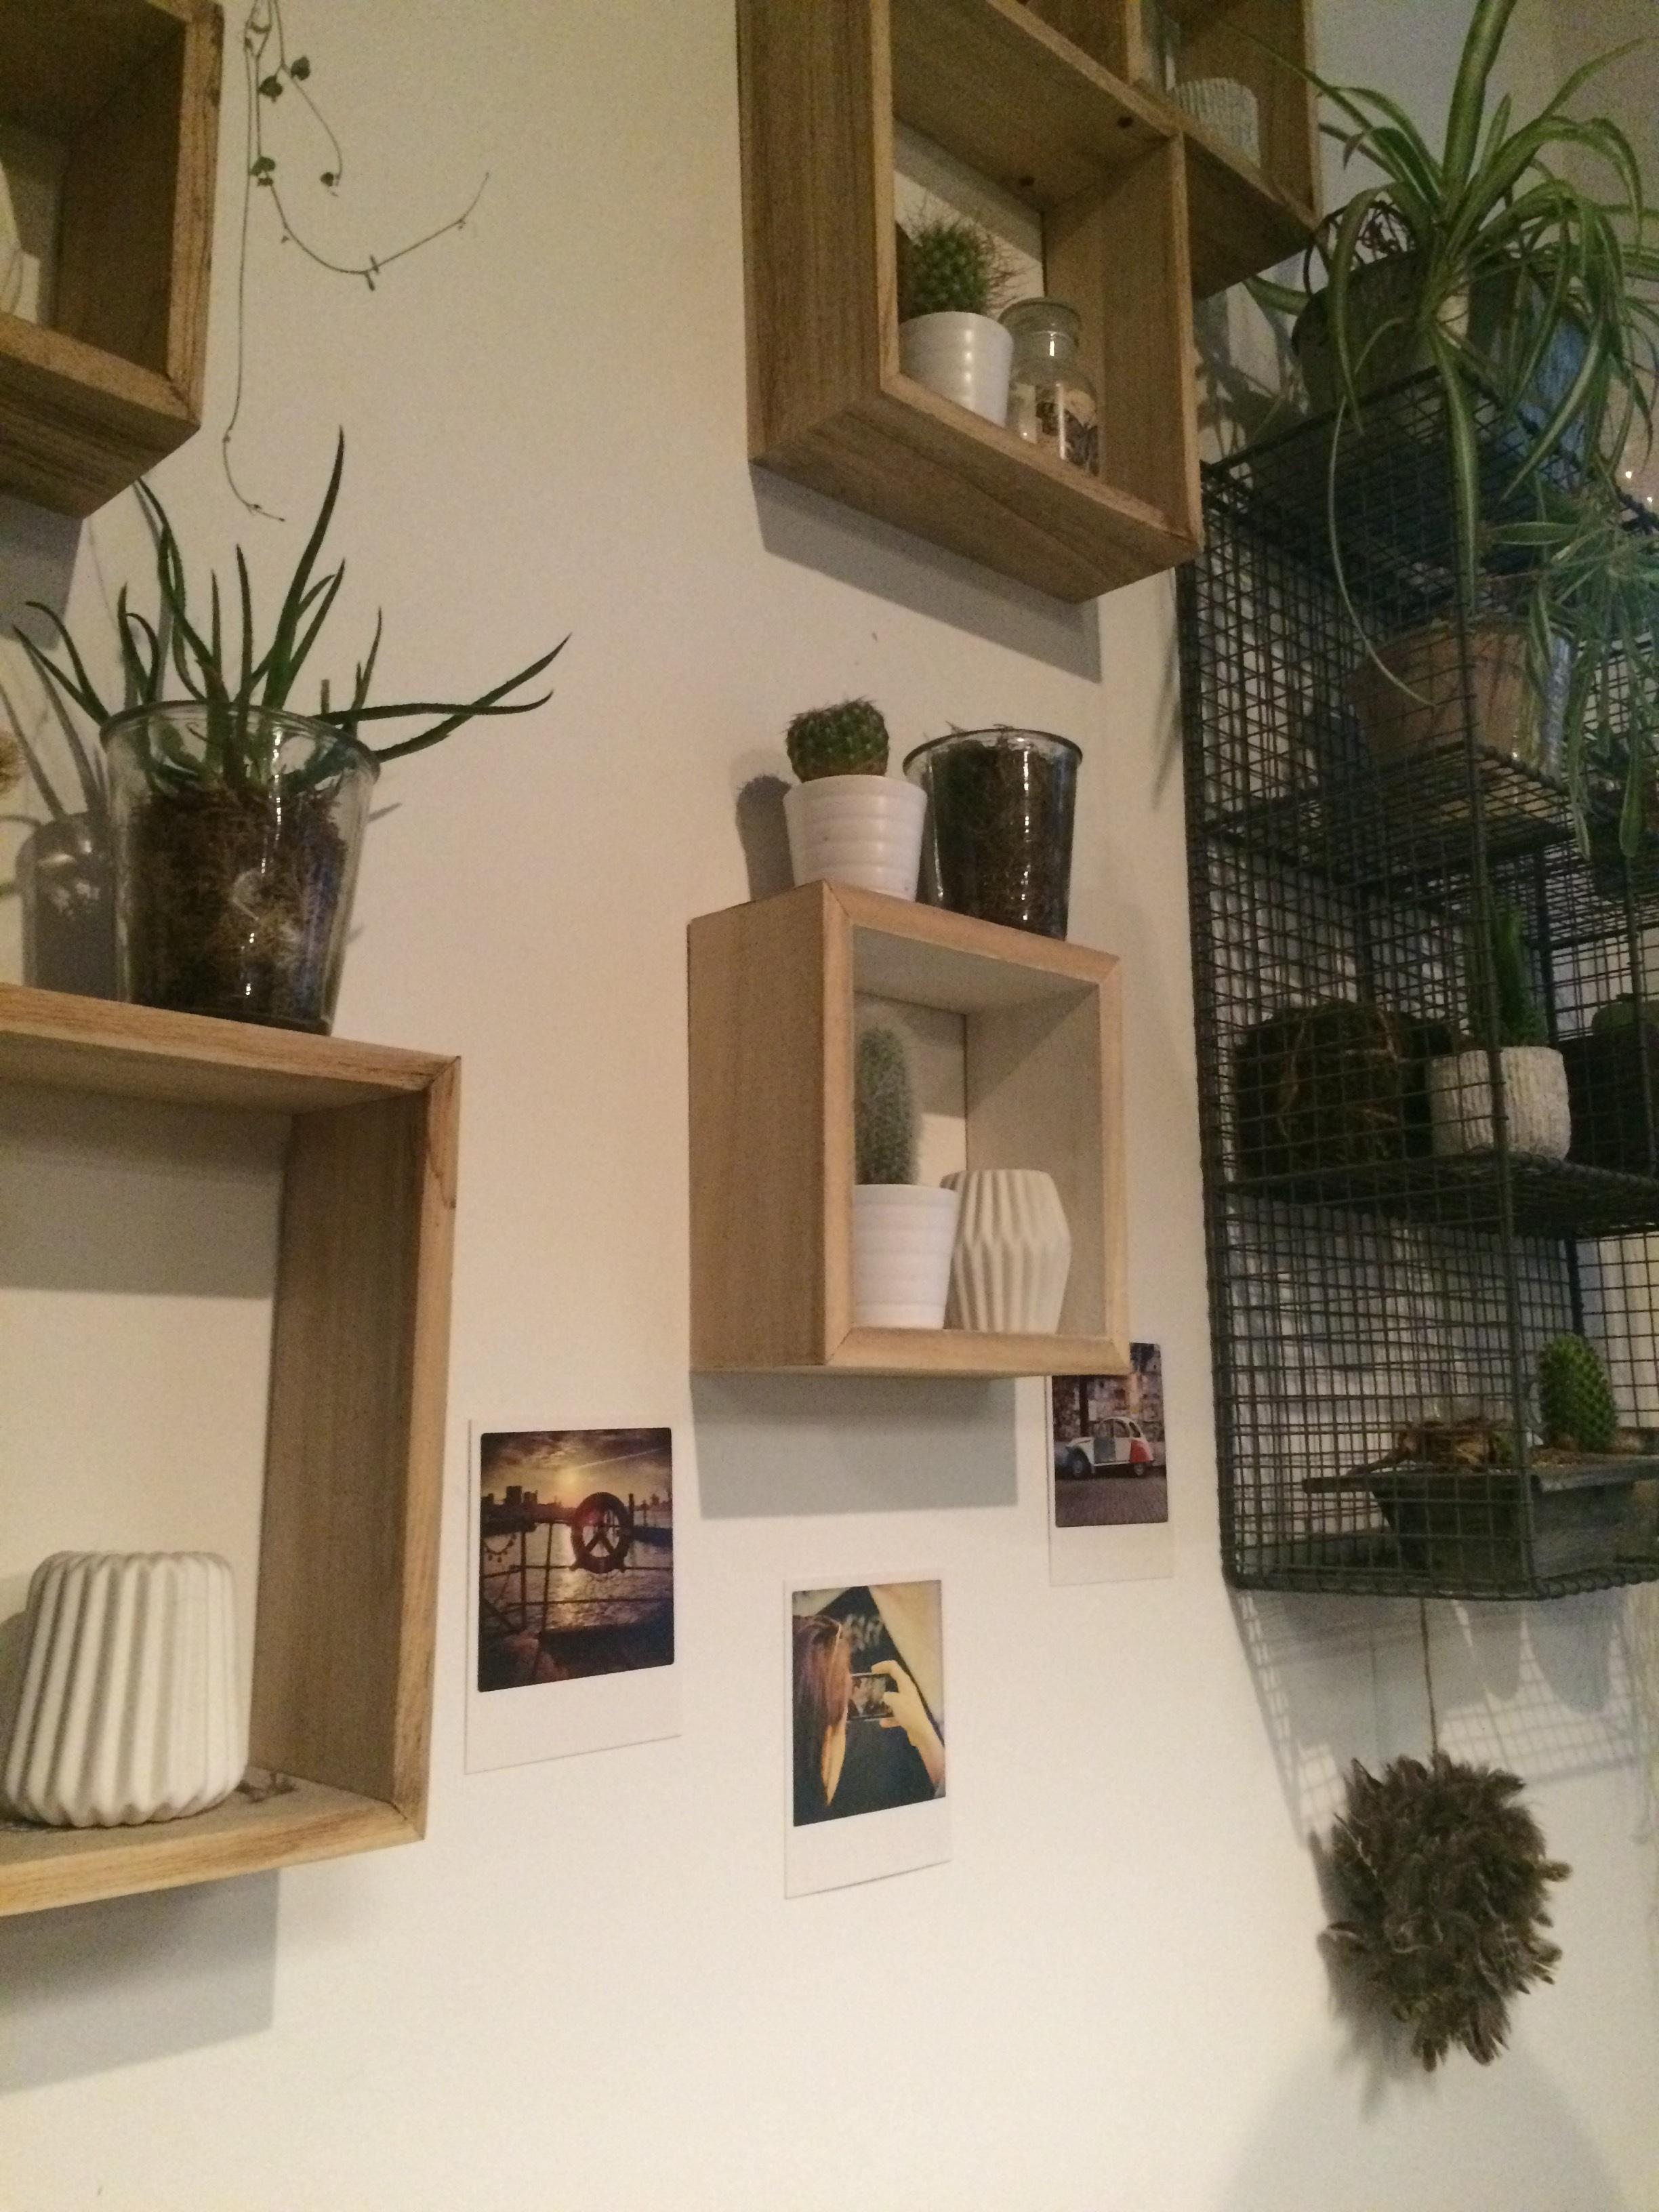 Urban Jungle an der Wand im Wohnzimmer #regal #wohnz...